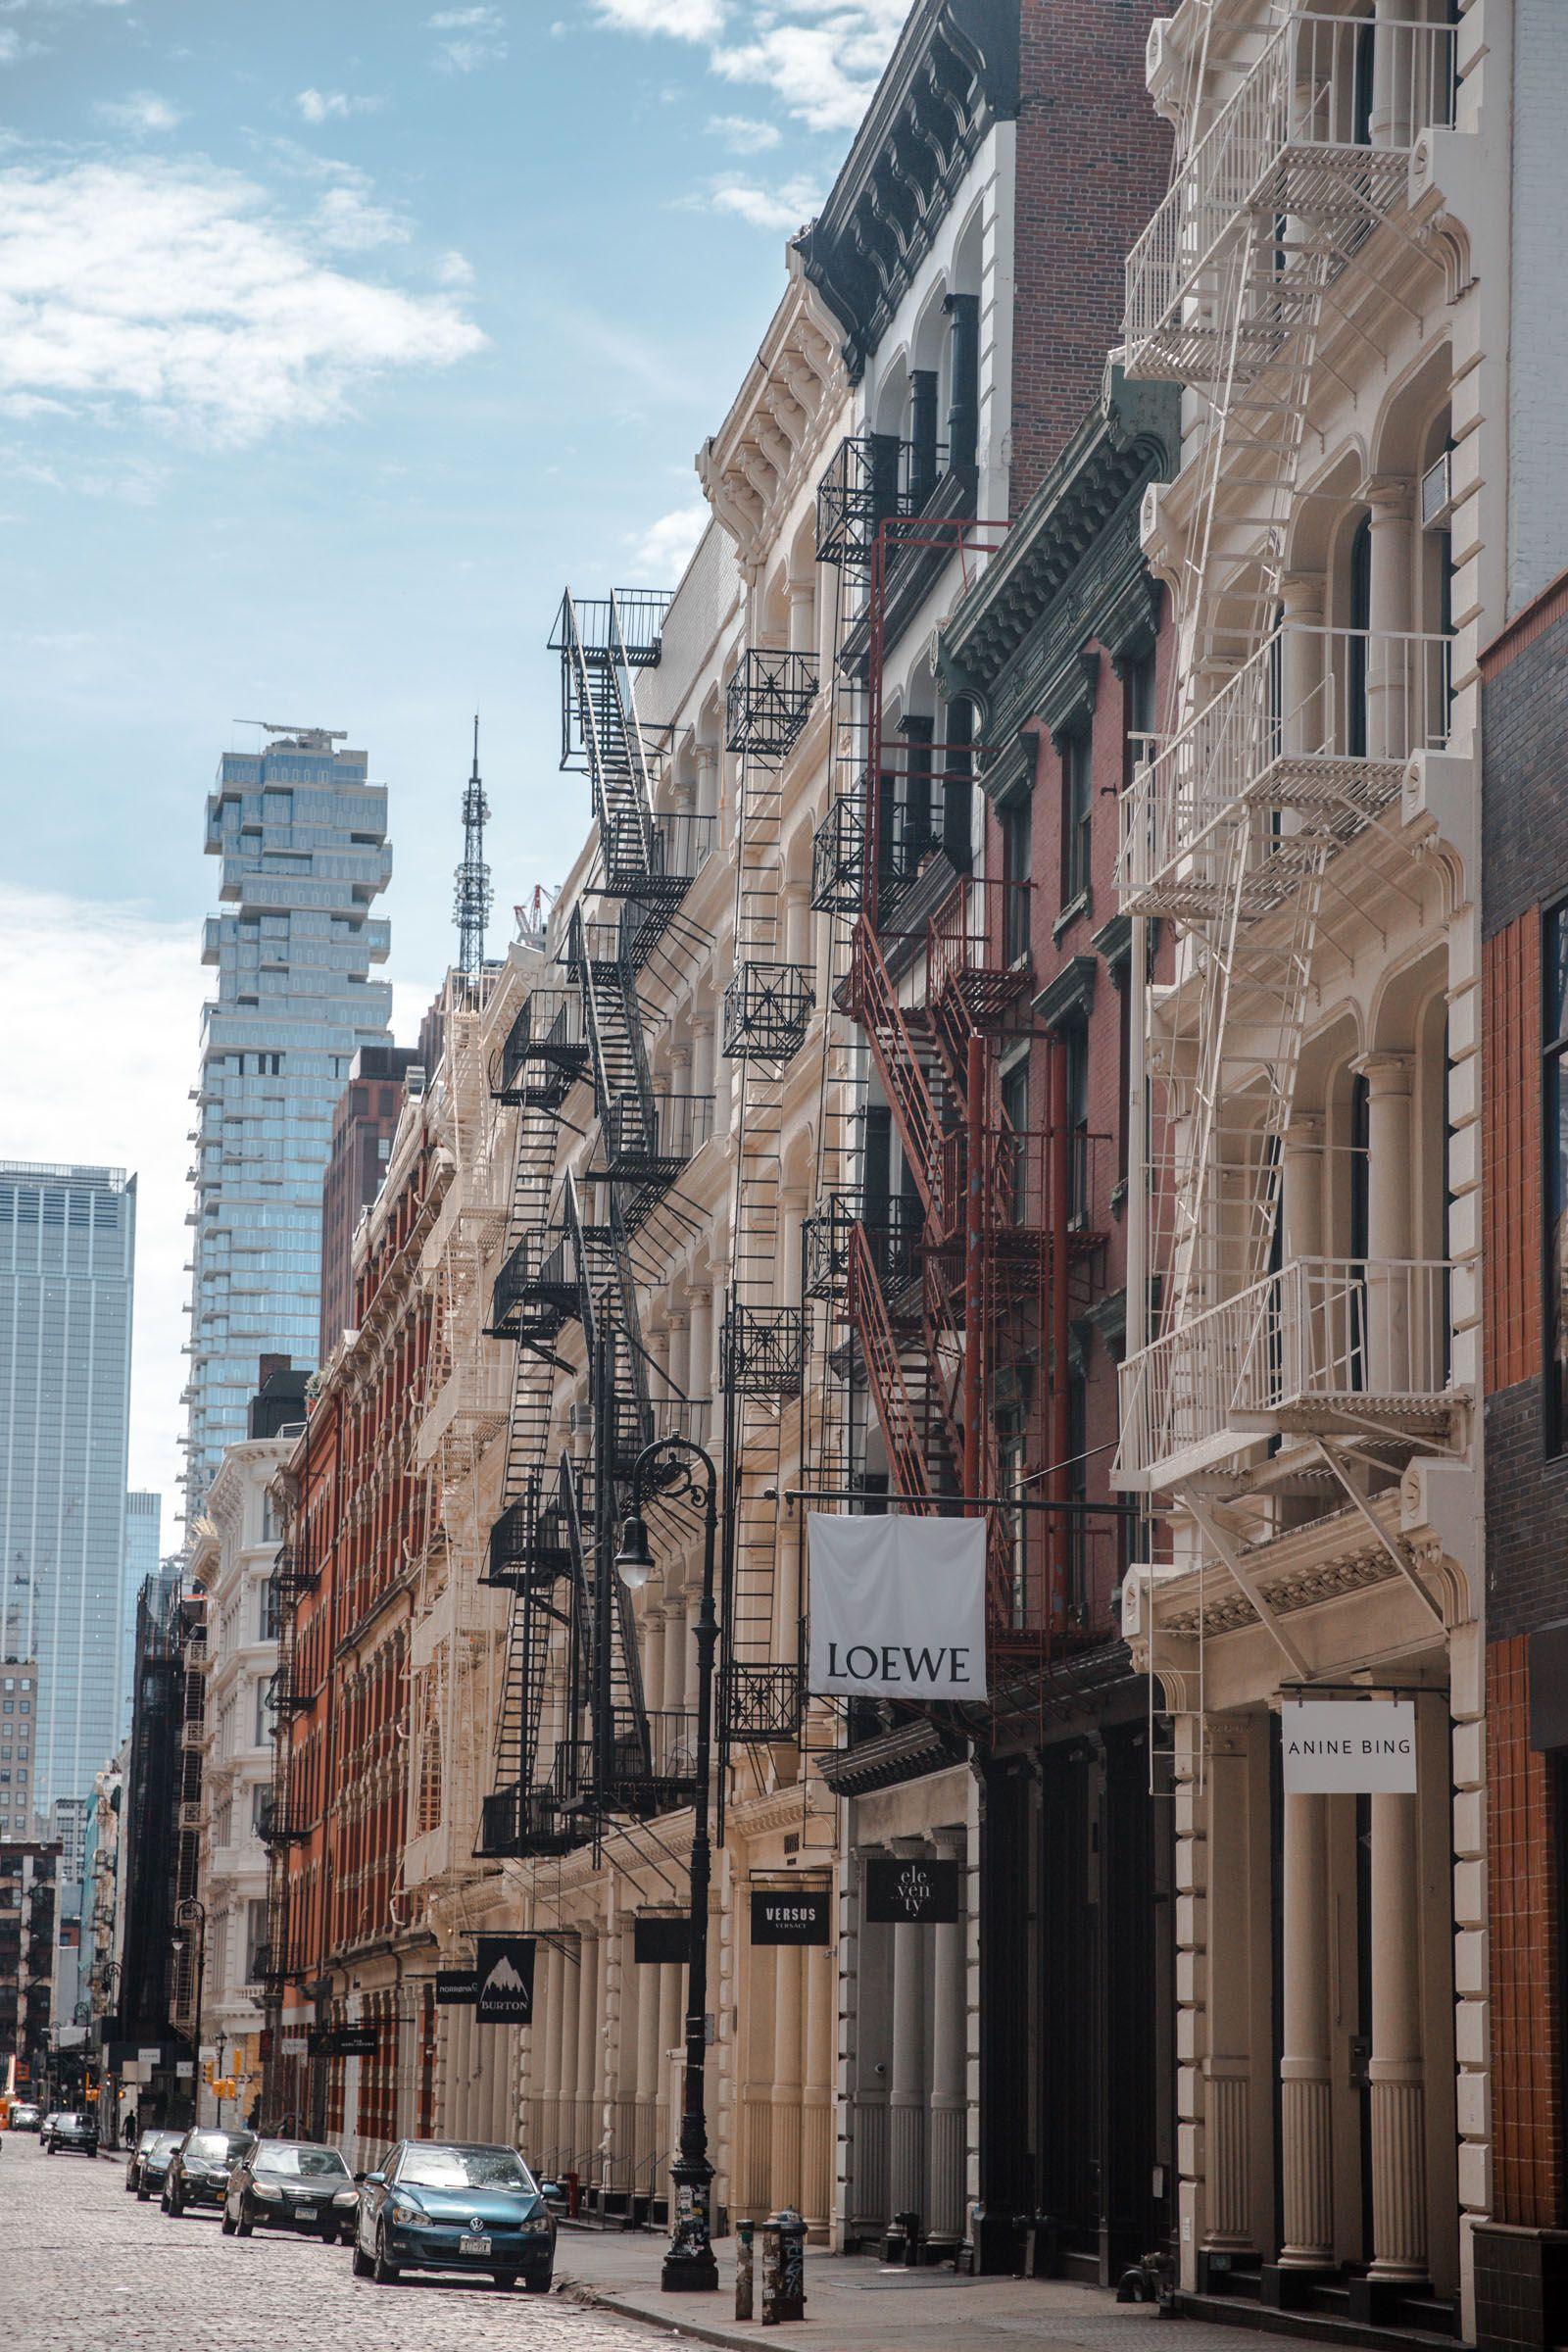 40 photos of NYC during Quarantine Showcasing what New York City looks like by neighborhood through this photography diary. New York Aesthetic. Soho NYC